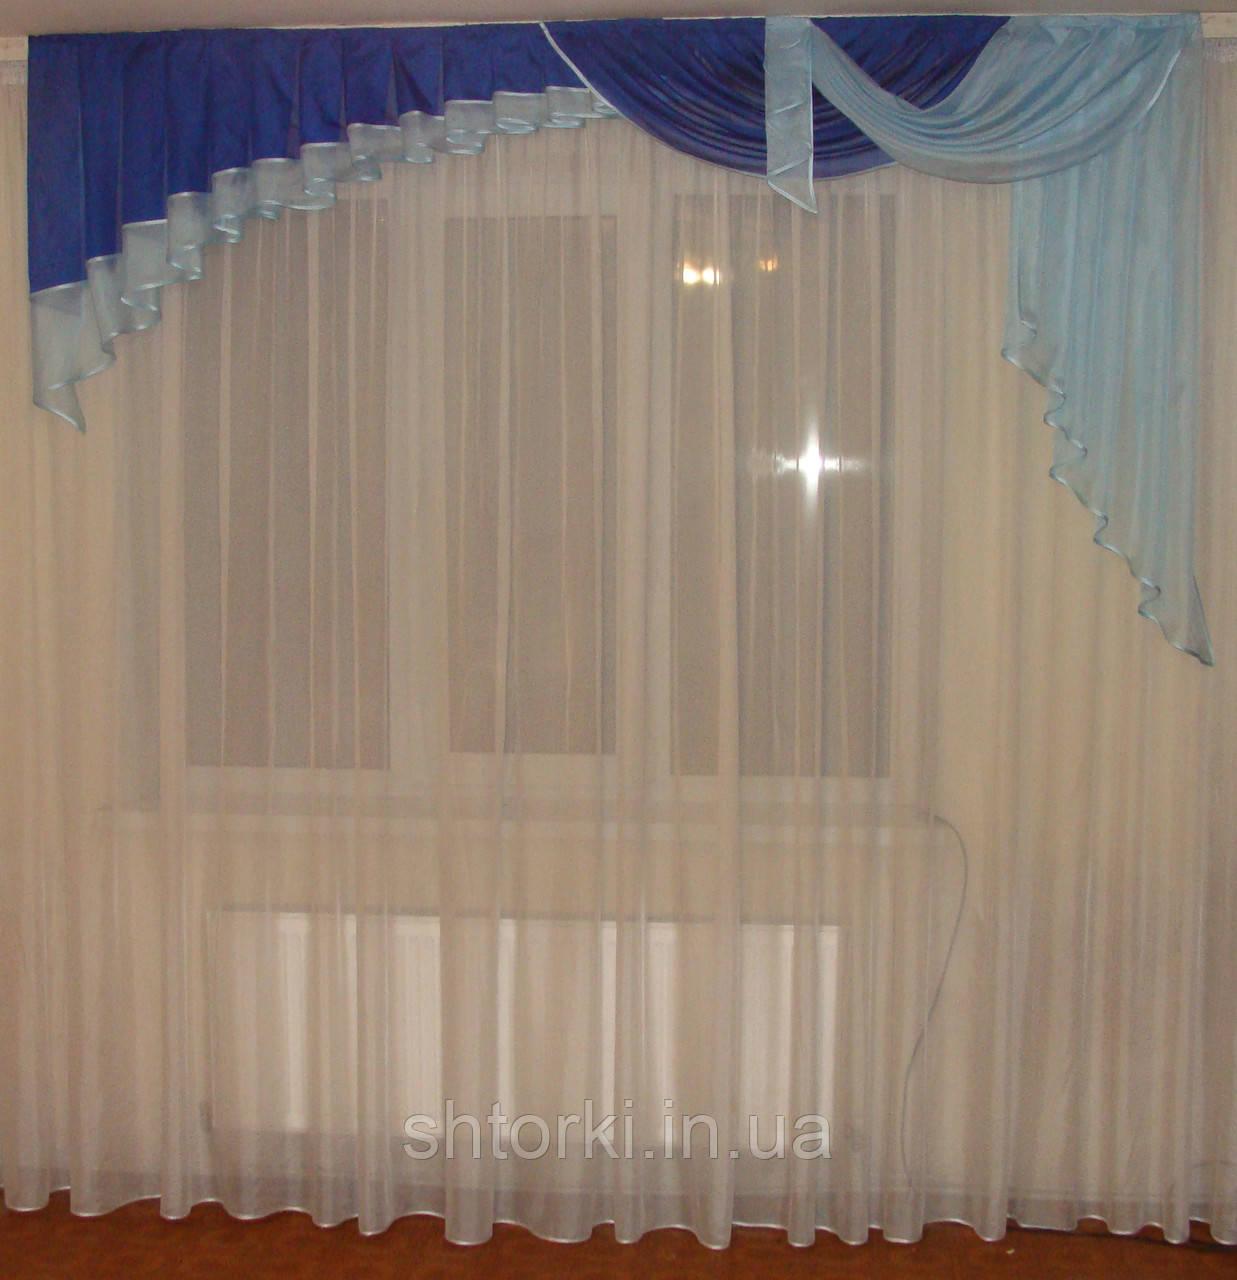 Ламбрикен Ассиметрия 2,5м синий